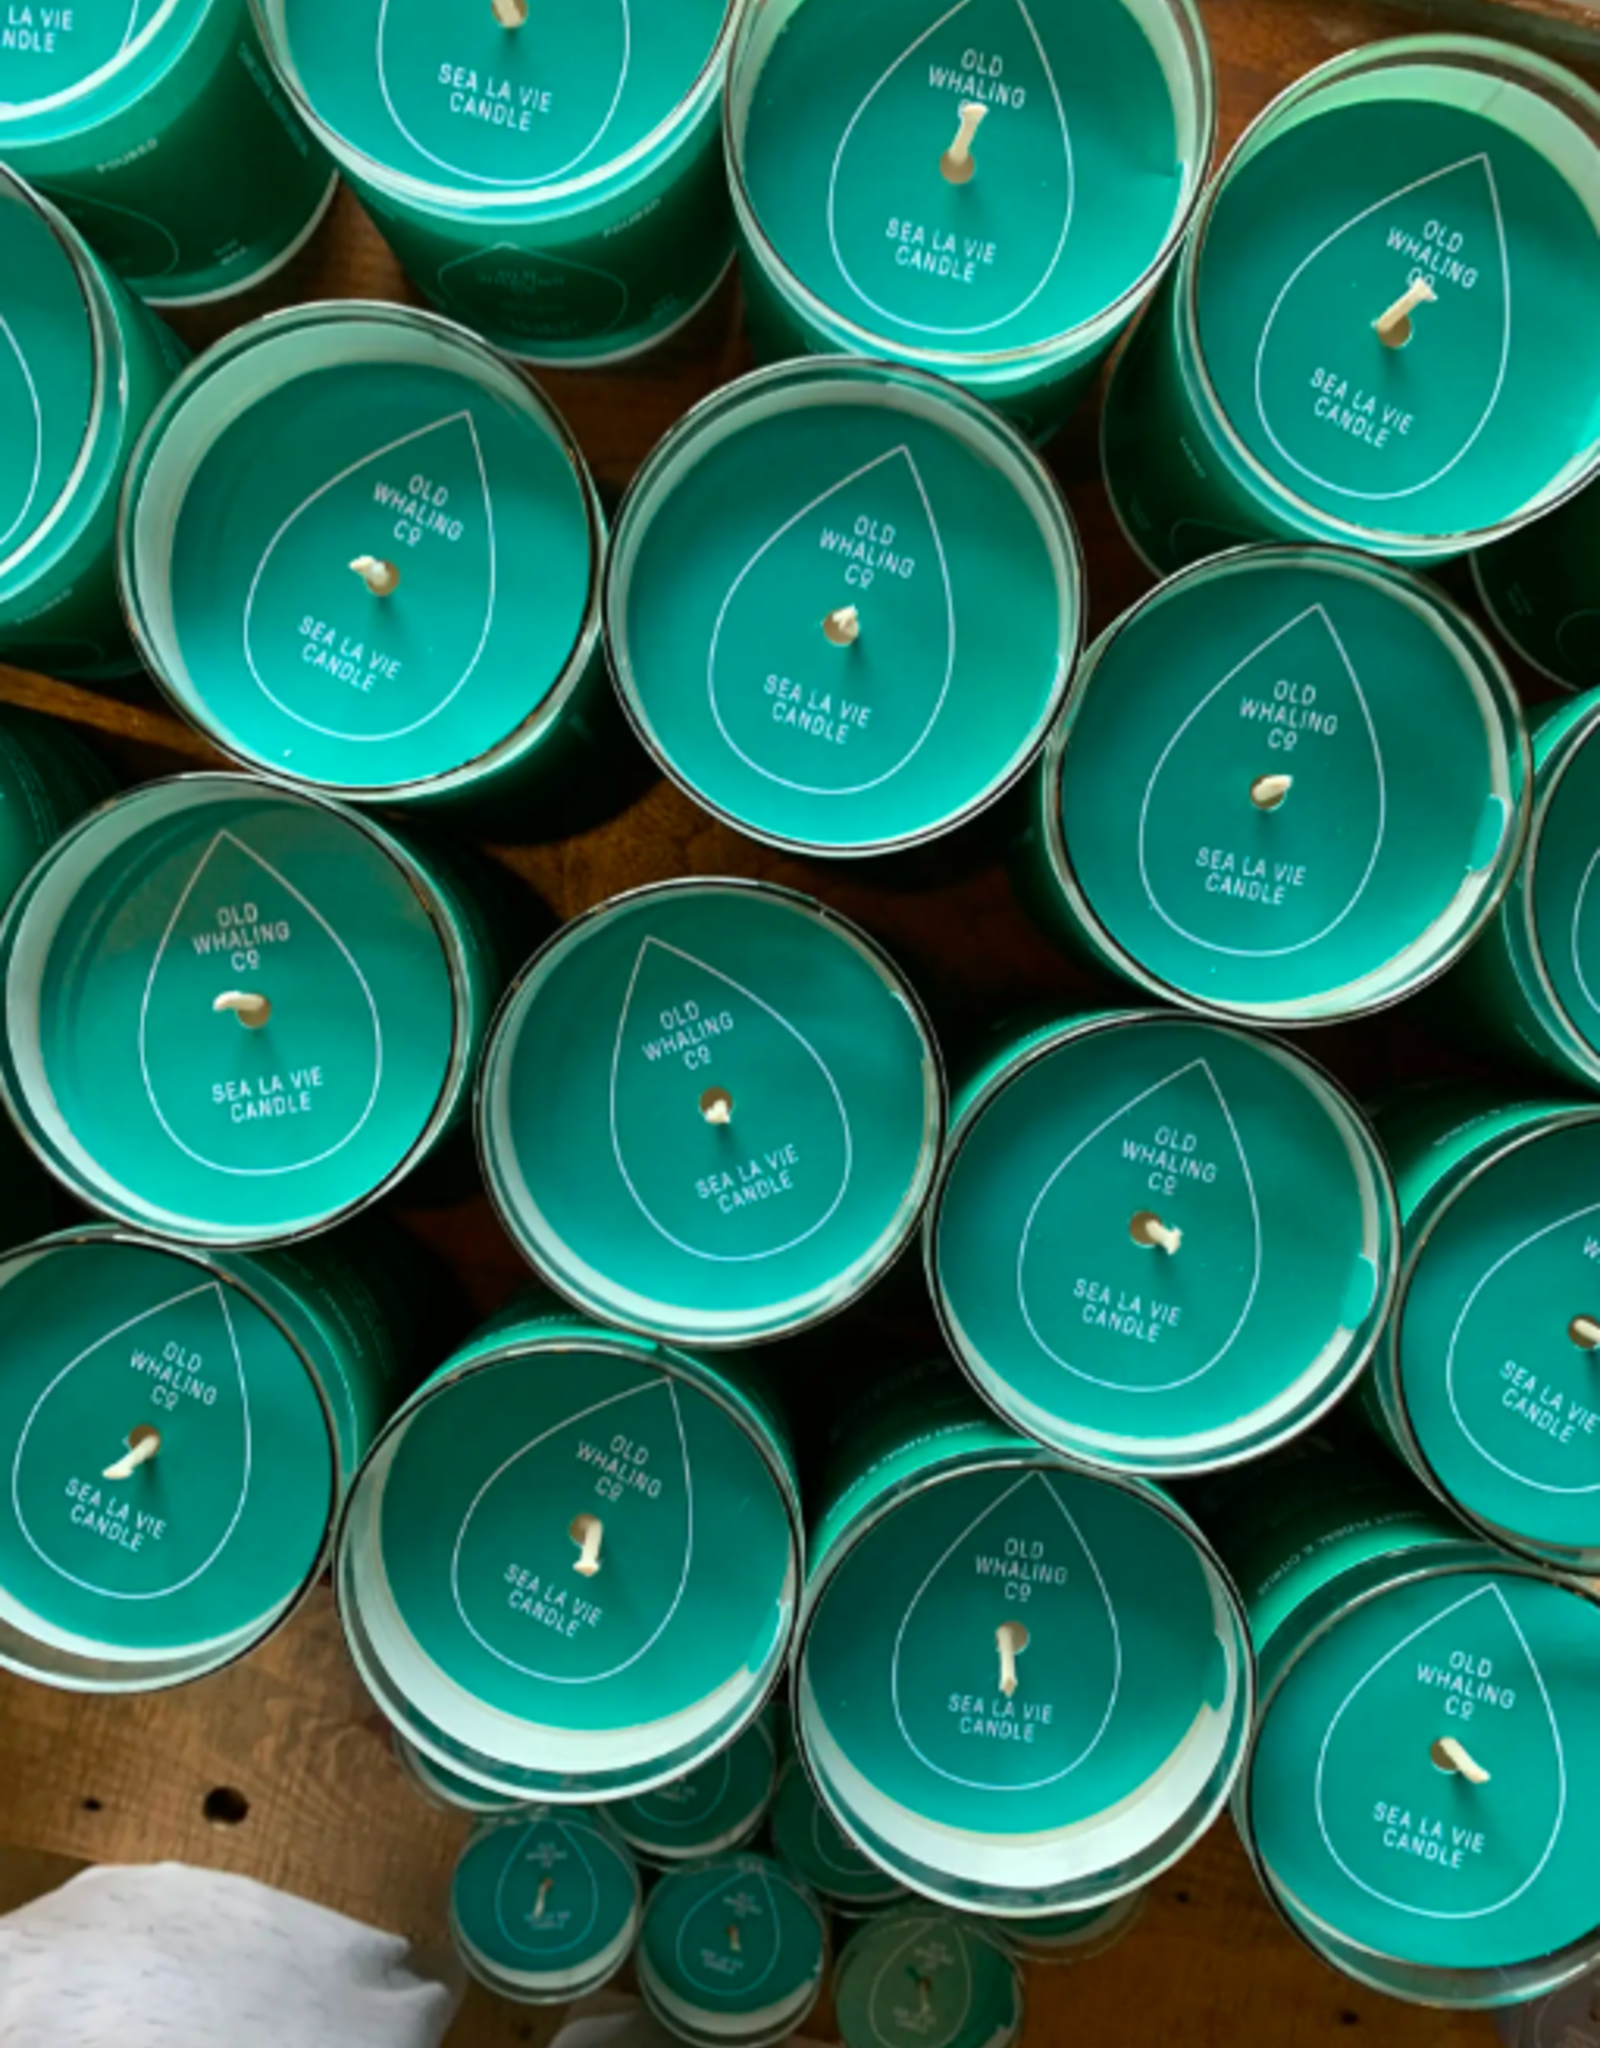 Sea La Vie Candle